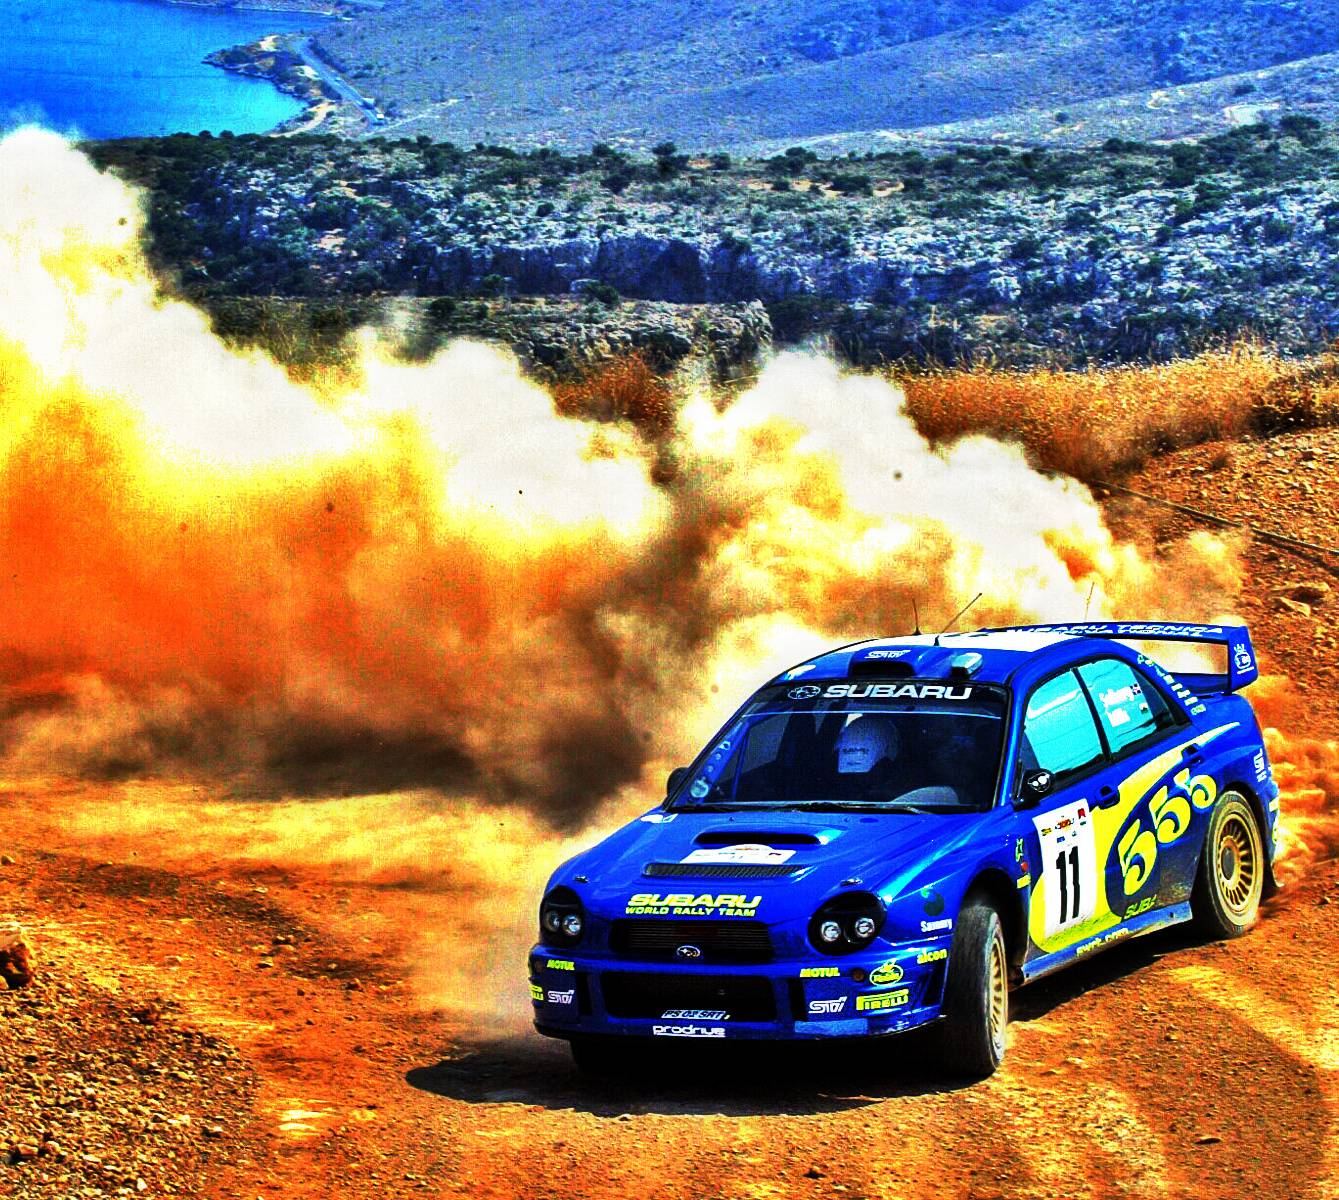 Subaru Rally Wallpaper By Drifternick 67 Free On Zedge